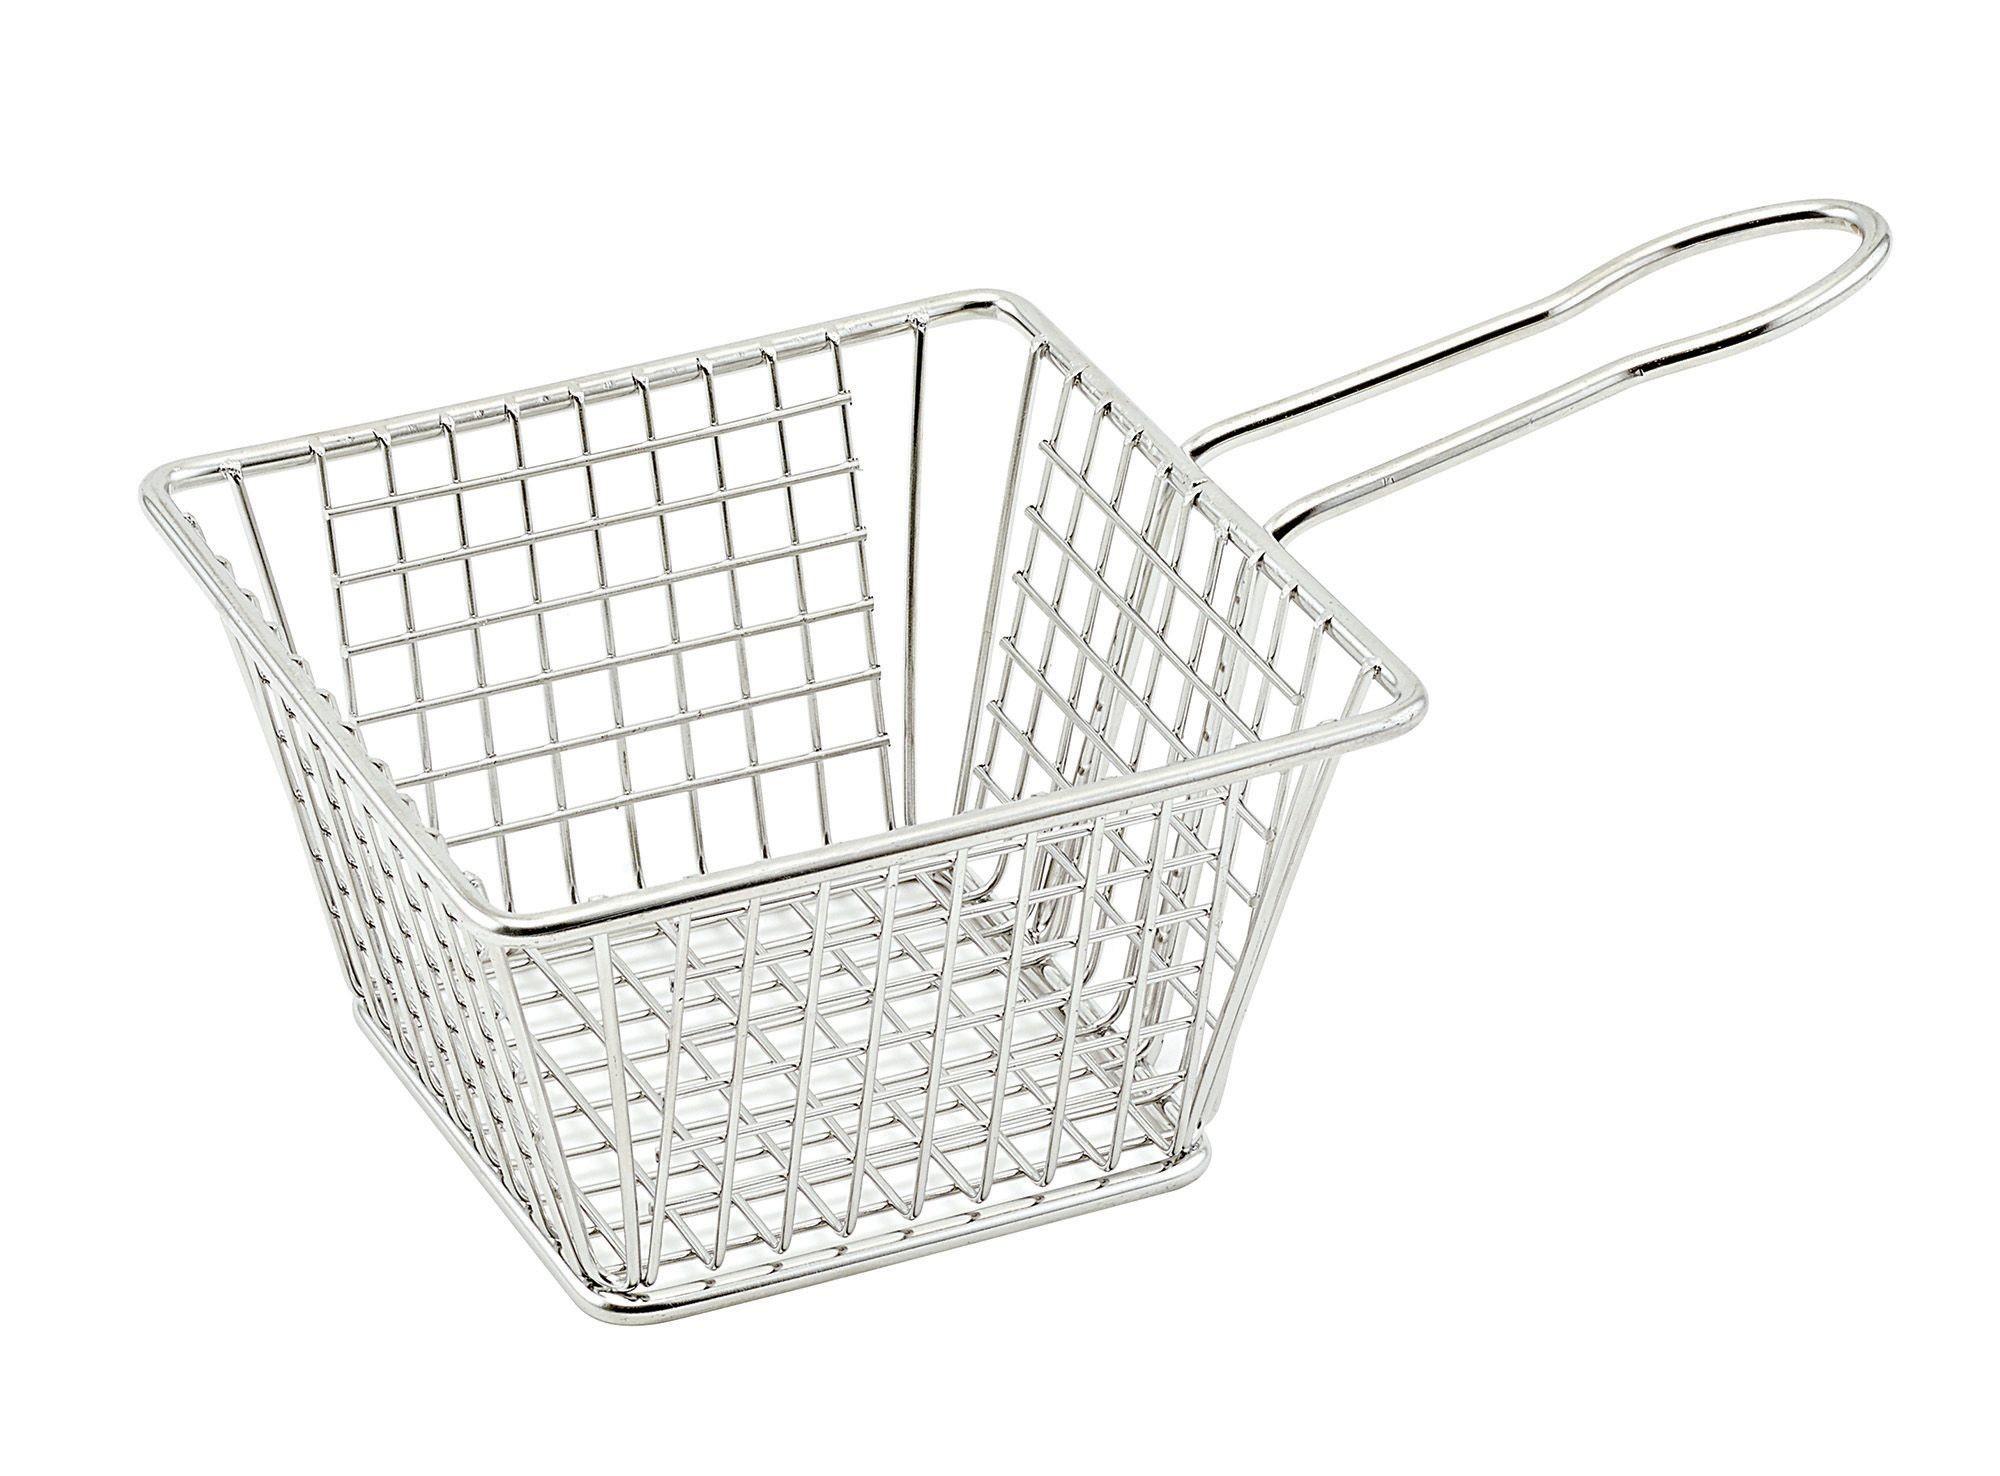 "Winco FBM-554S Square Stainless Steel Mini Fry Basket 5"" x 5"" x 4"""